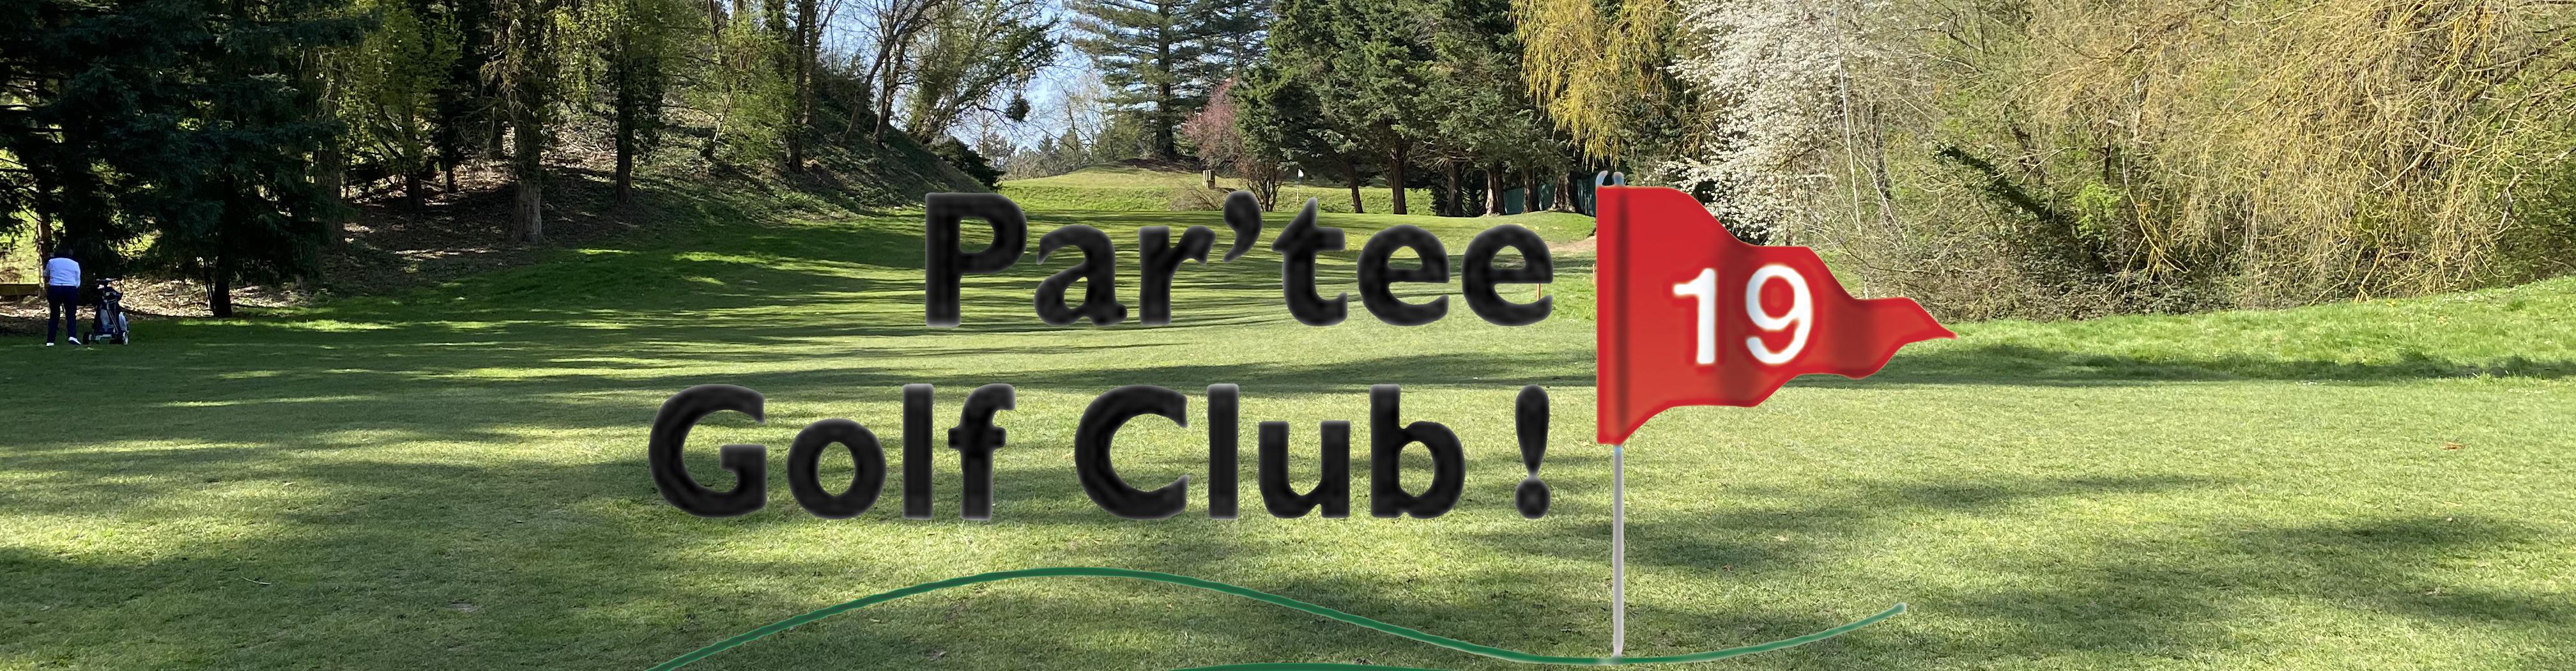 L'association golfique Par'tee Golf Club